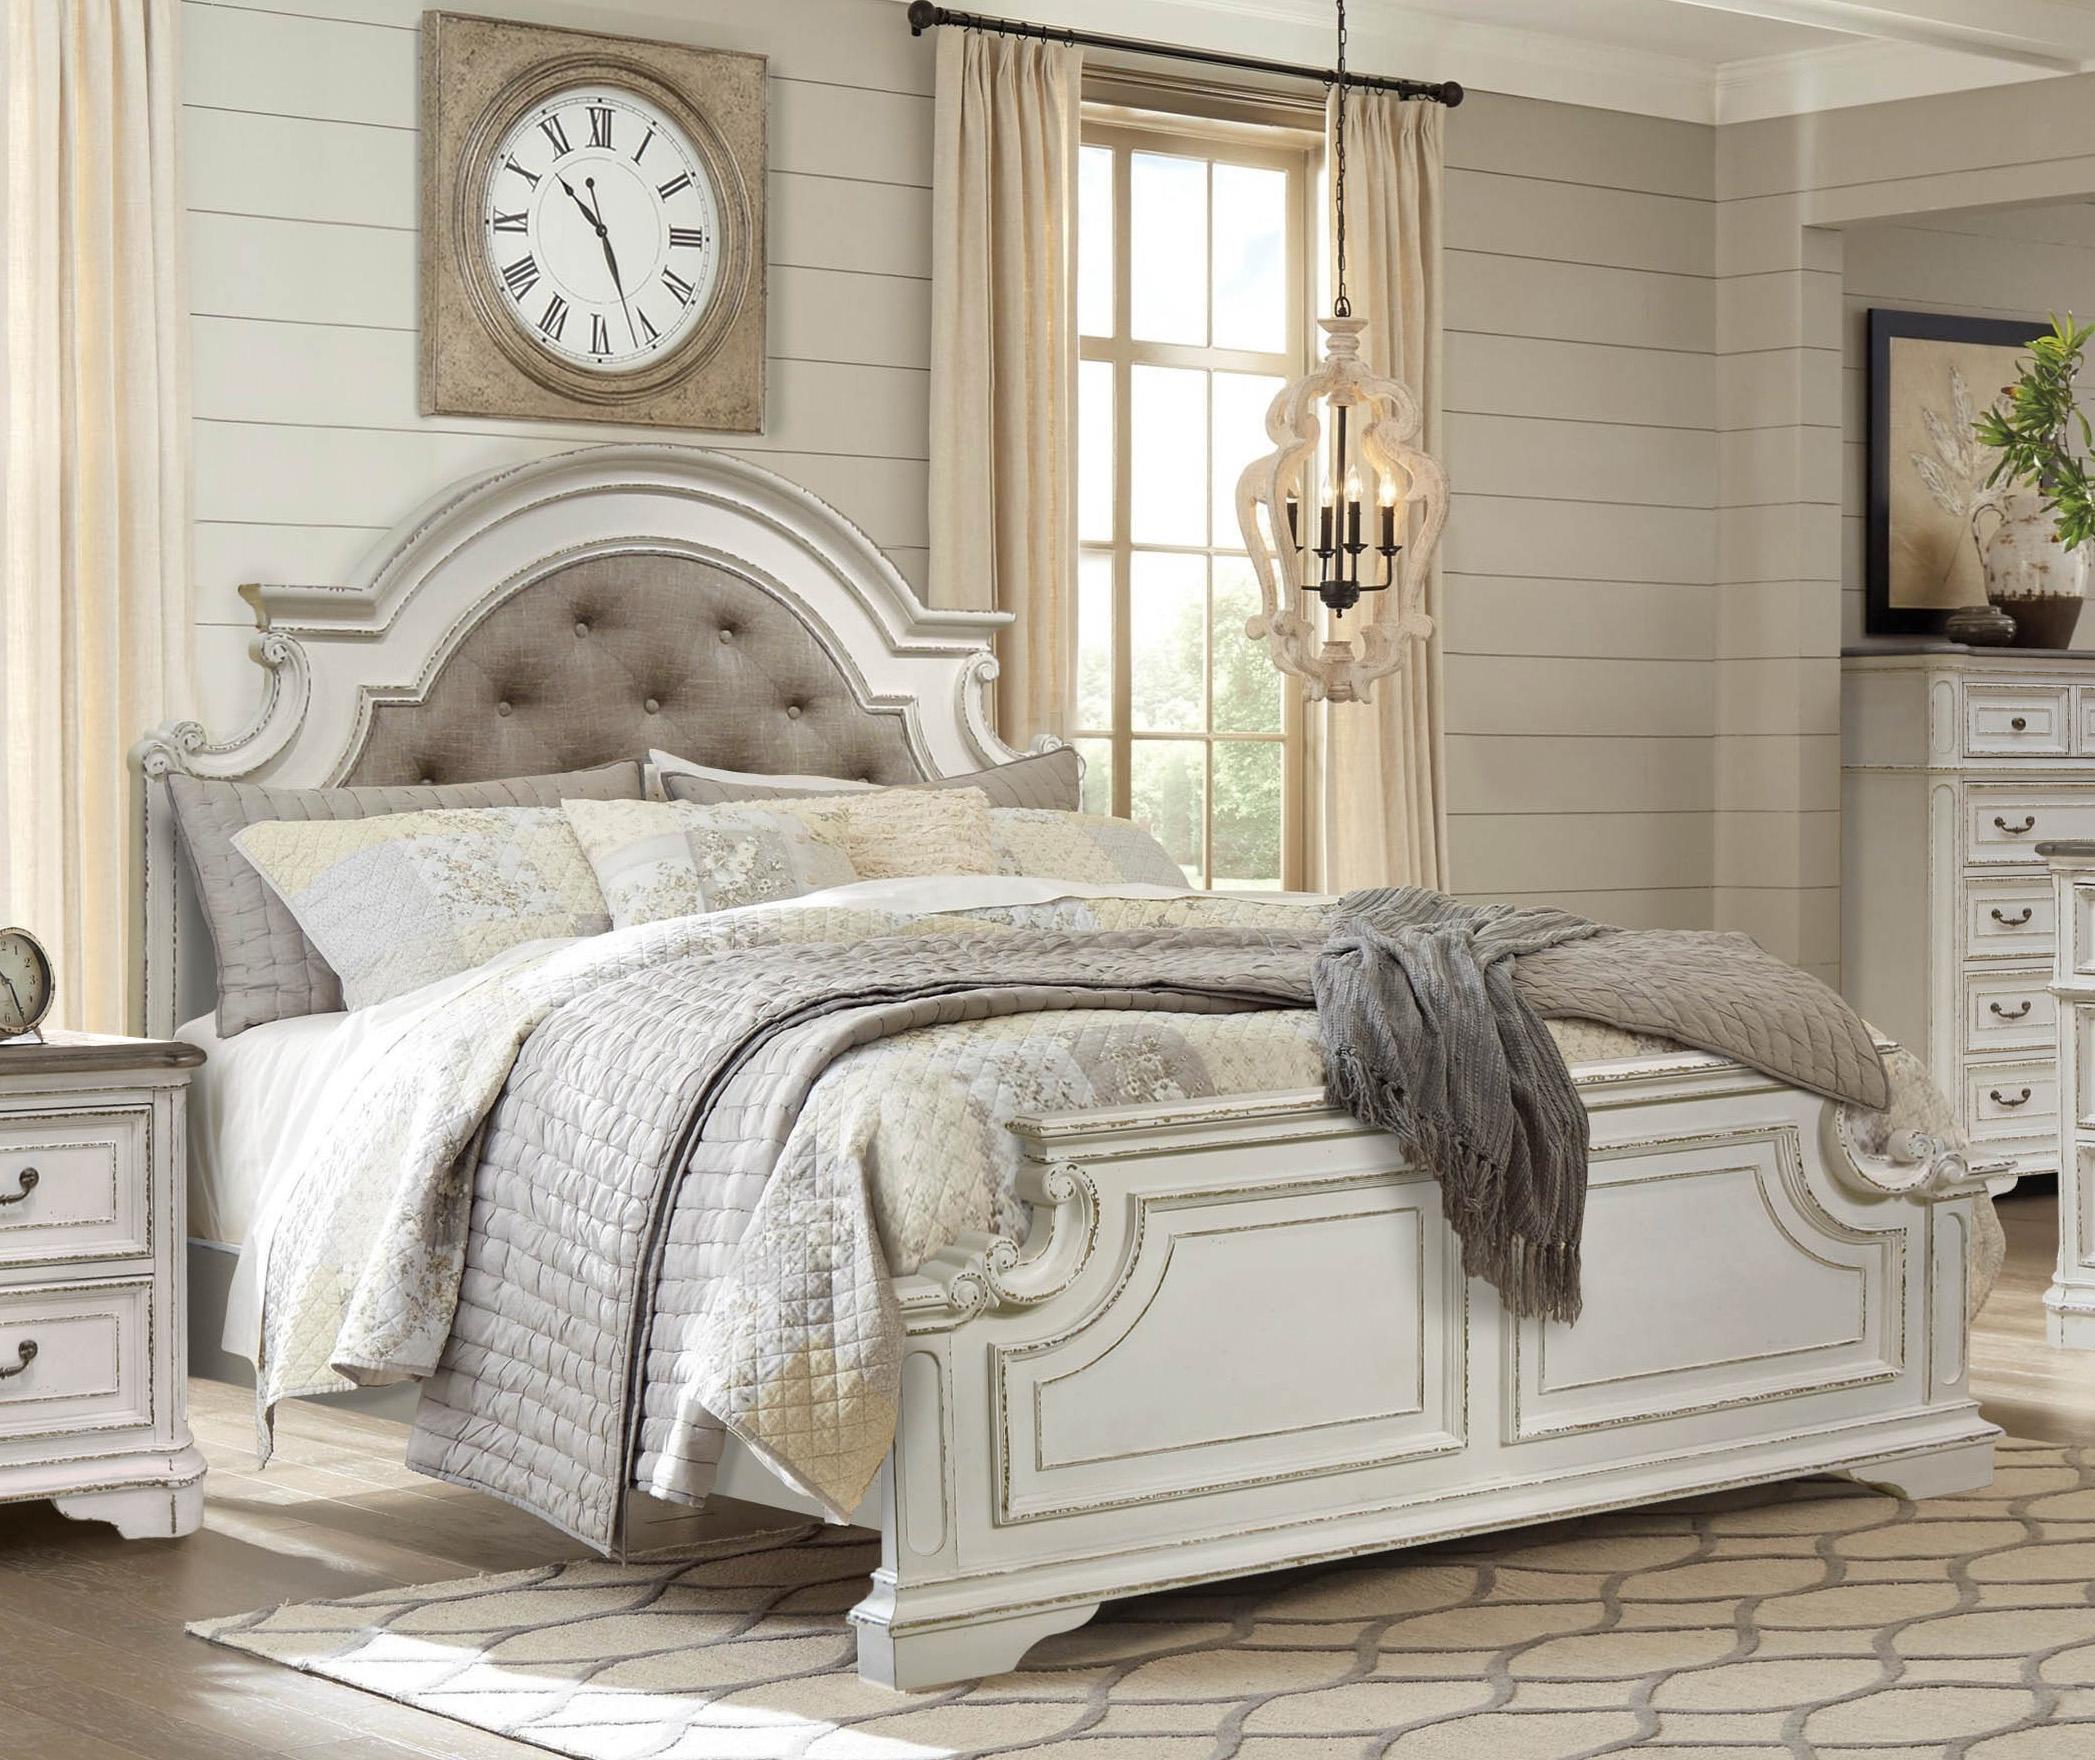 Albertville 4 Pc Antique White Bed With Dresser Mirror Night Stand